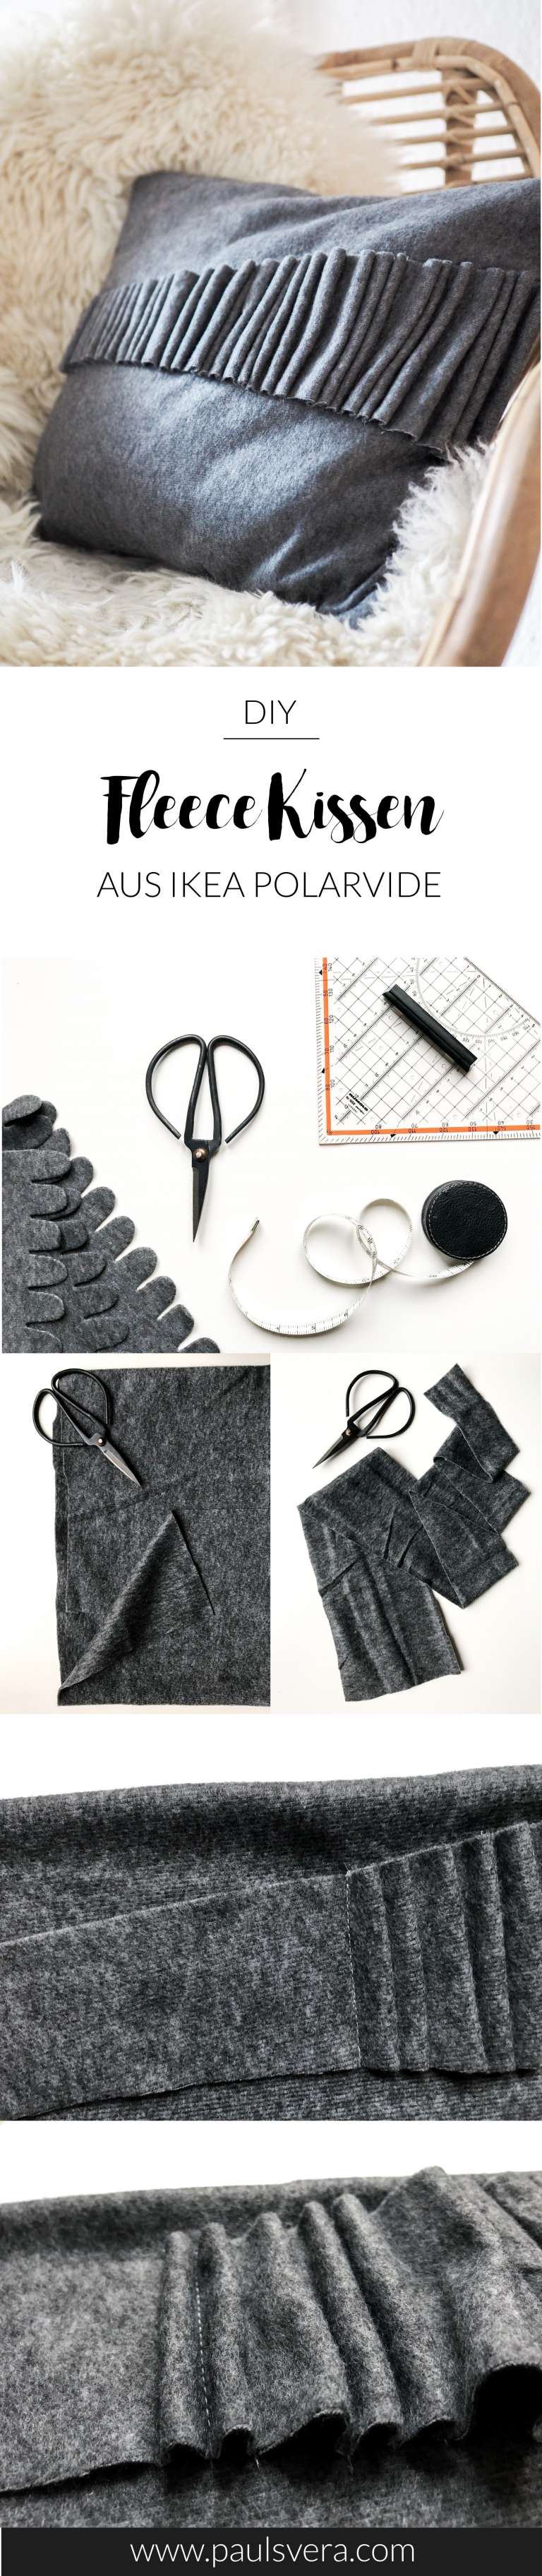 Anleitungsschritte-DIY-Kissen-selber-machen-Ikea-Hack-DIY-Deko-paulsvera